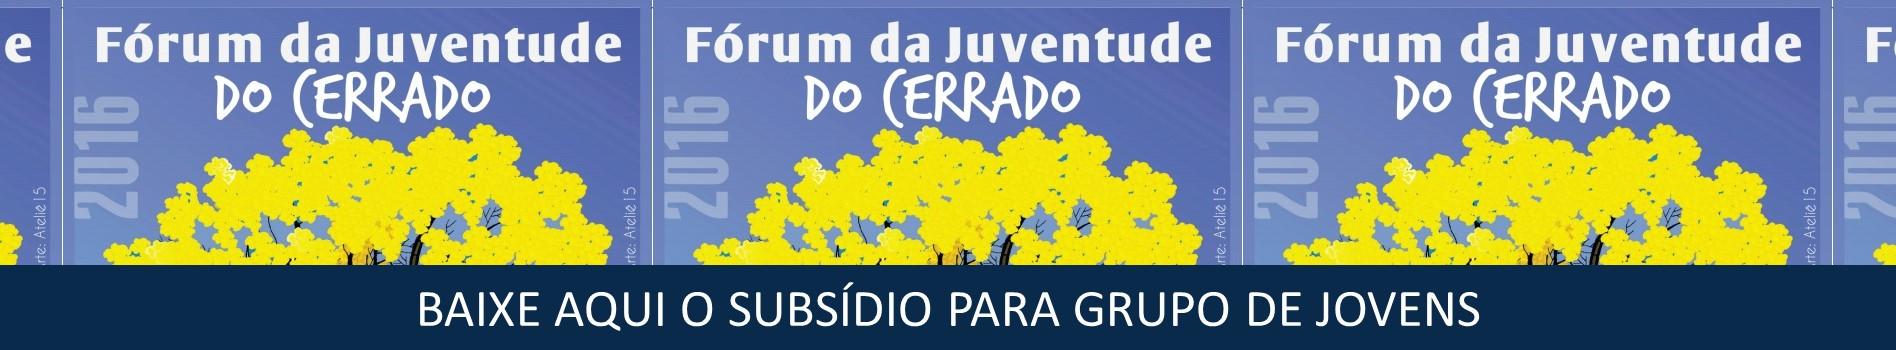 Subsidio Forum Juventude do Cerrado